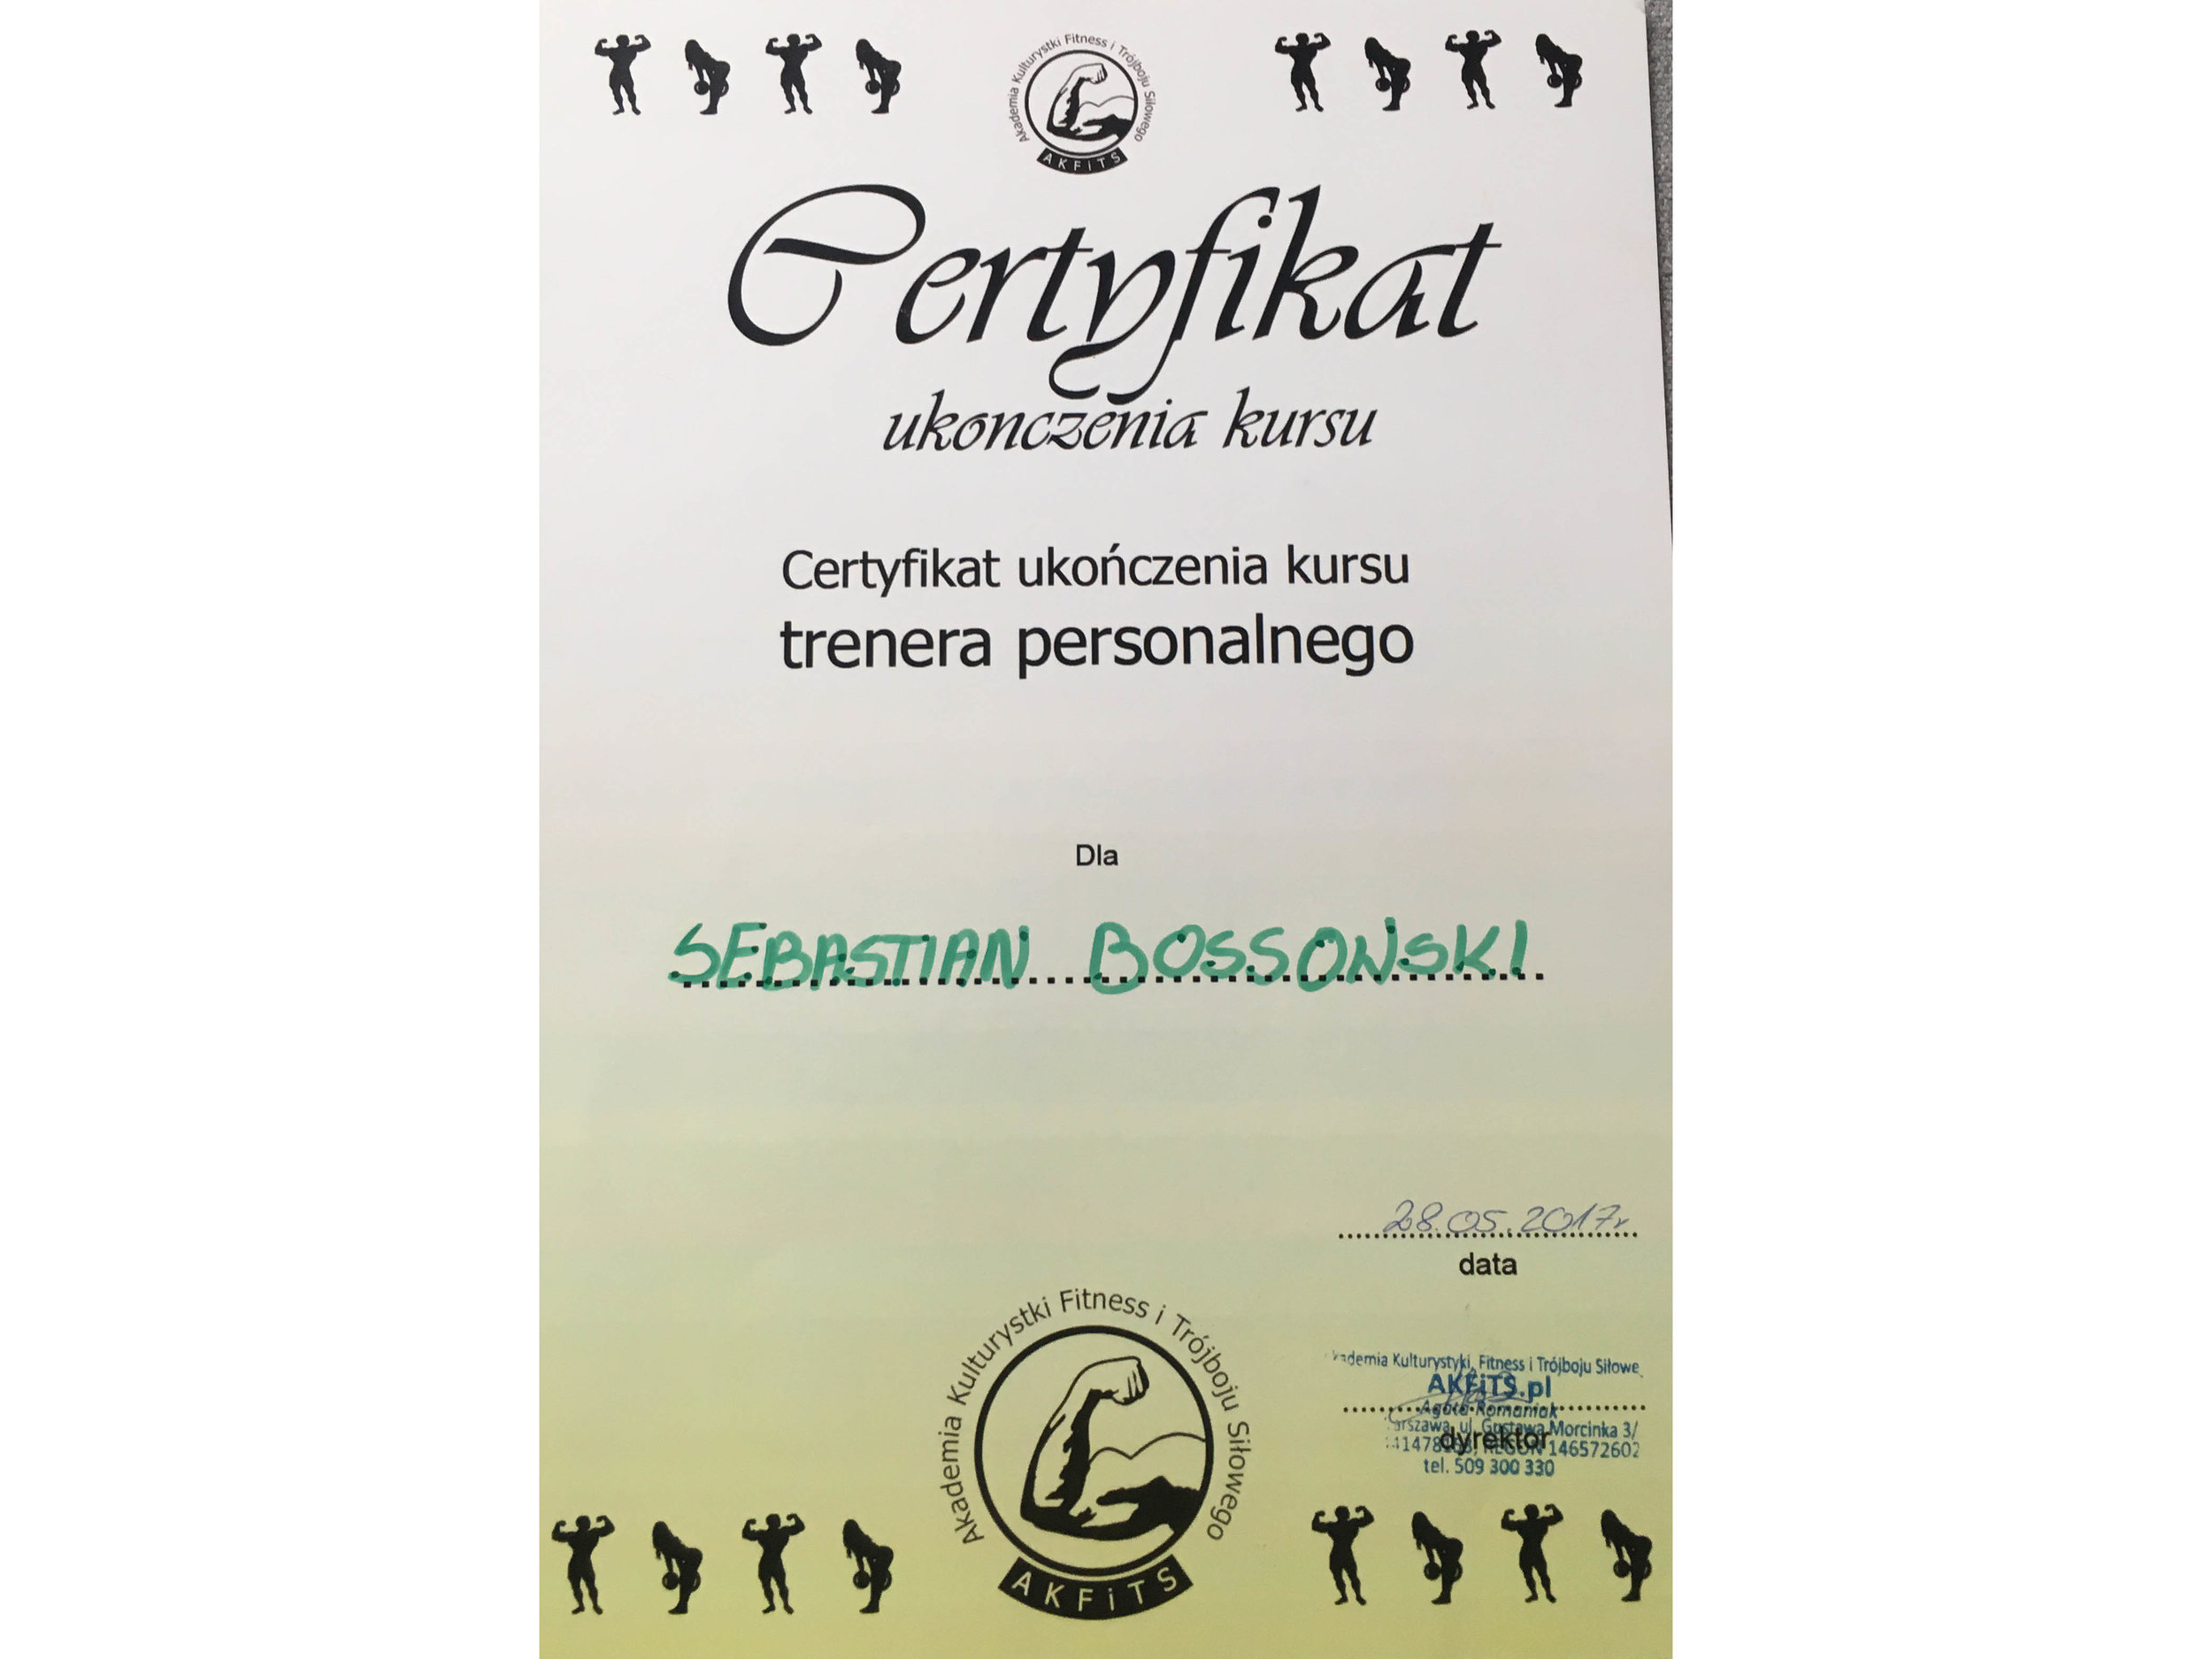 Sebastian Bossowski certyfikat 3.jpg